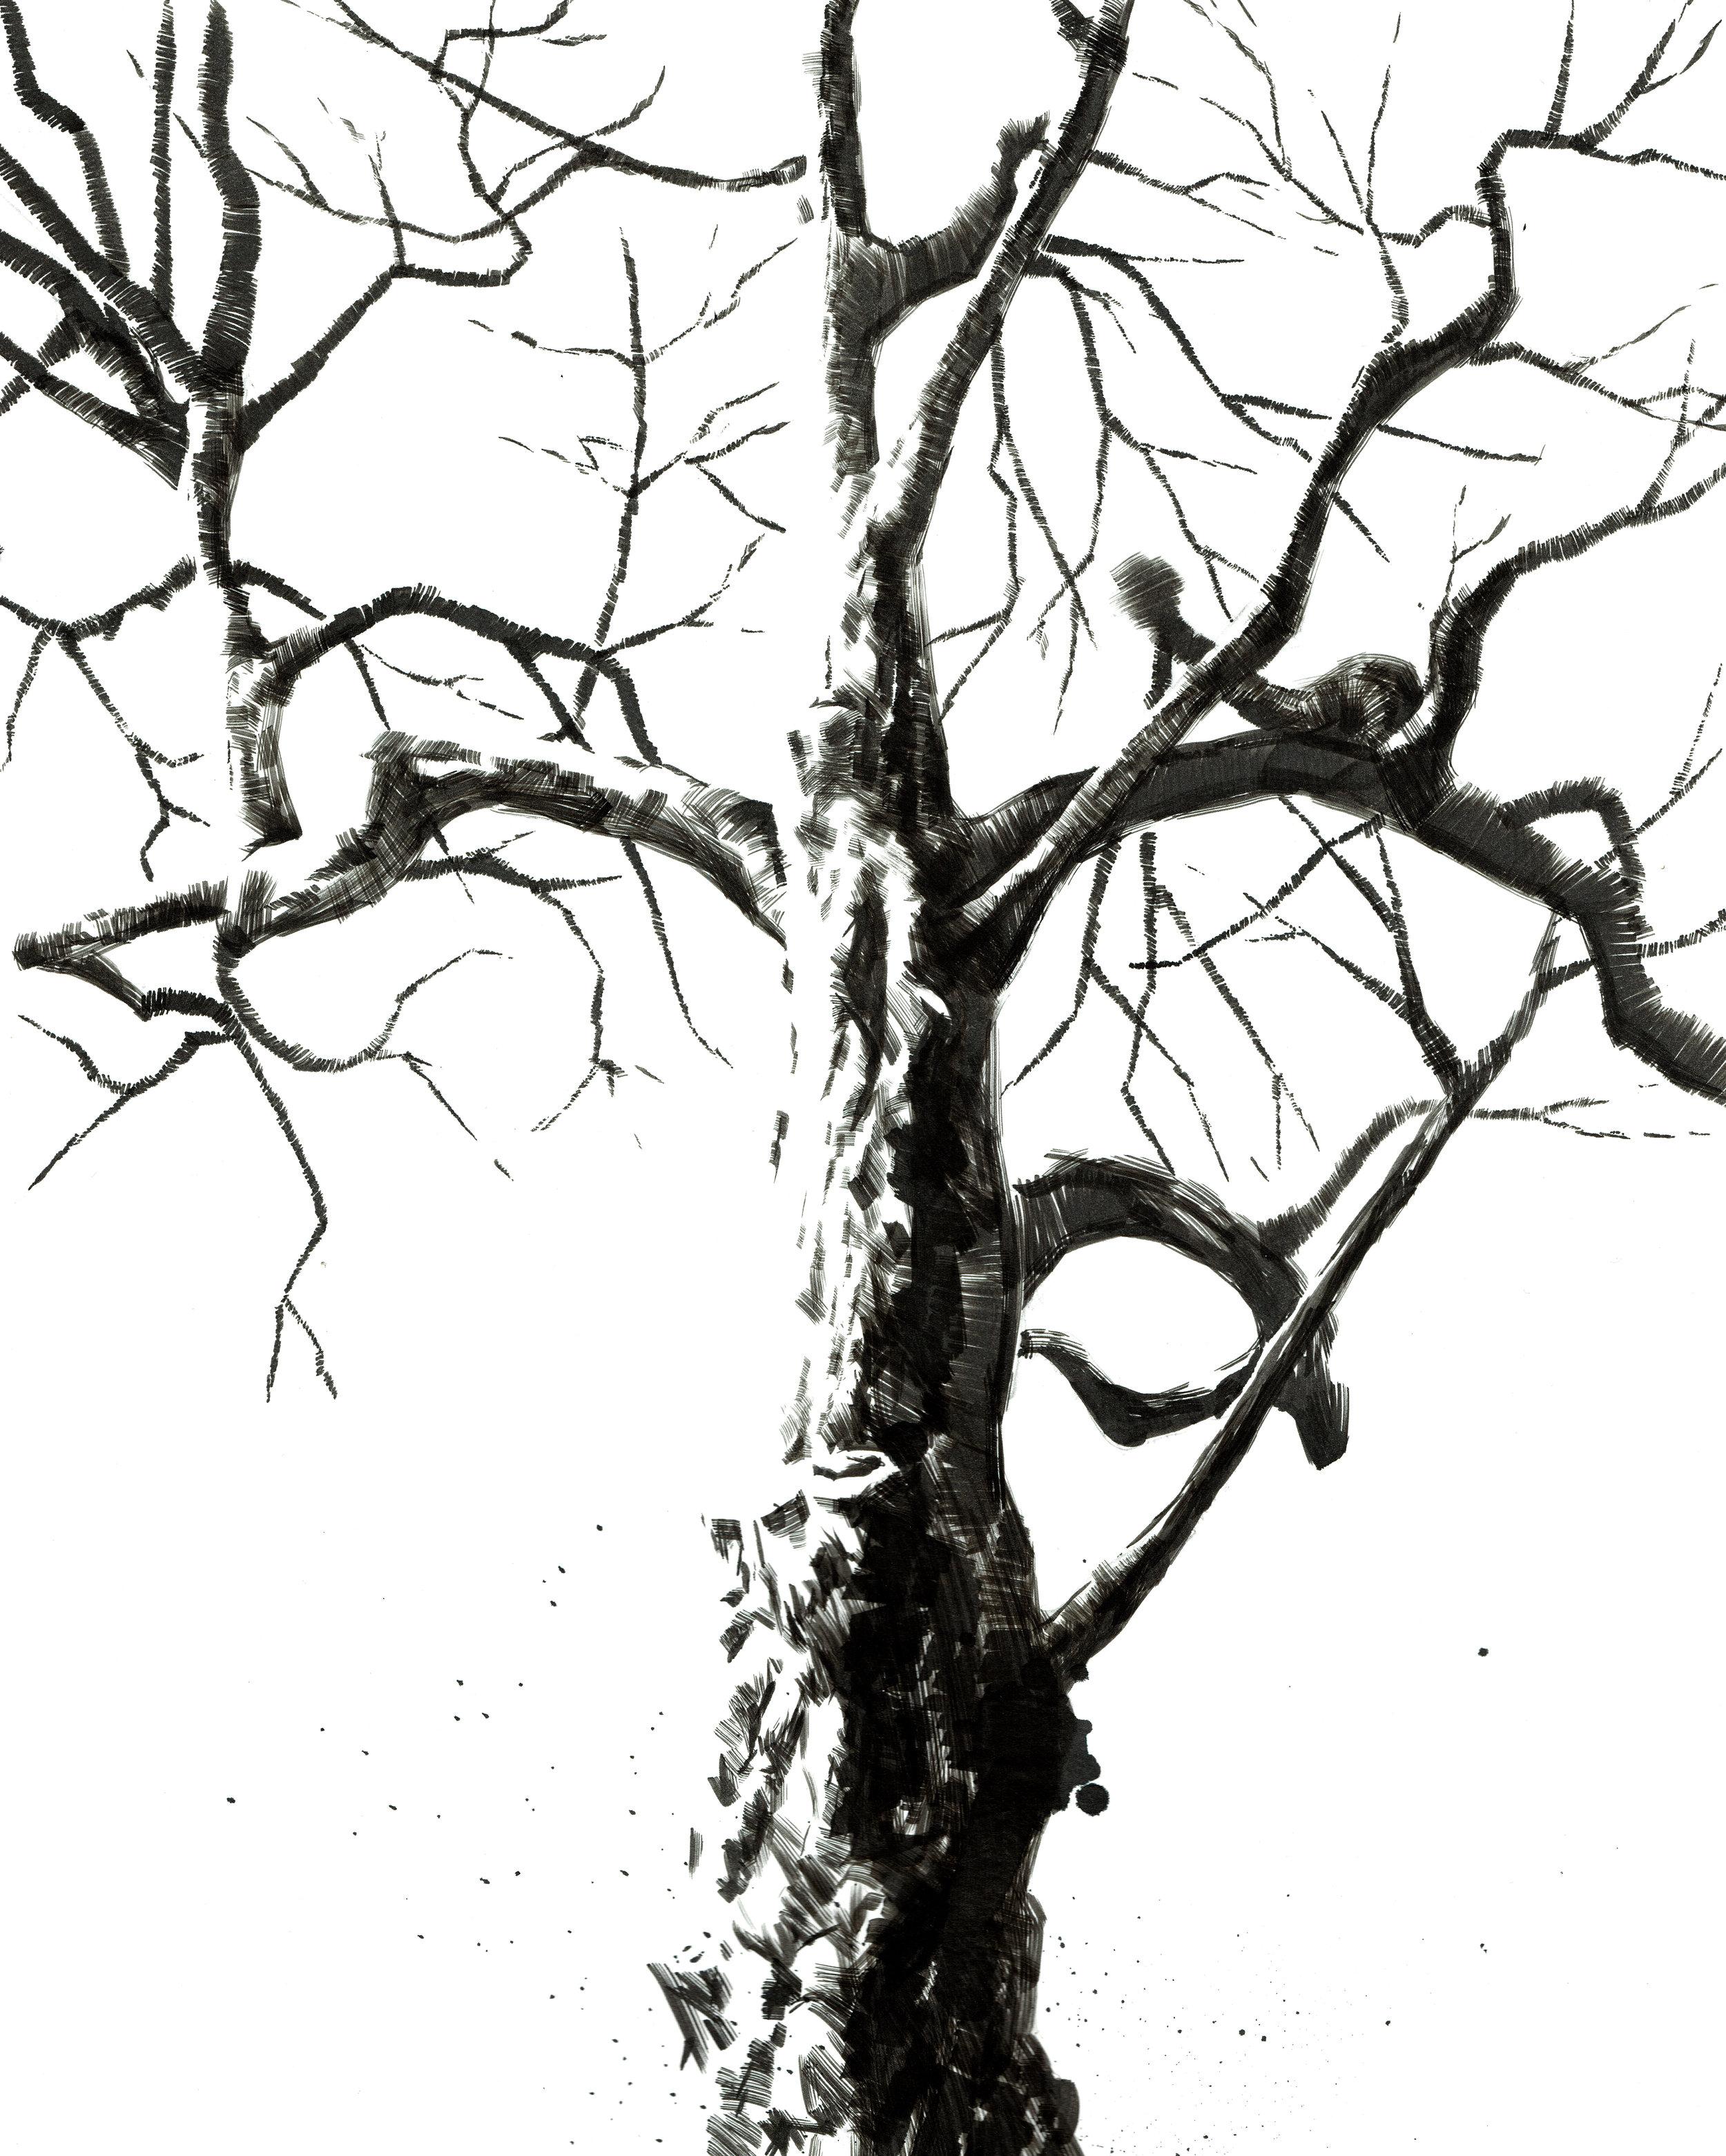 tree-study-02.jpg